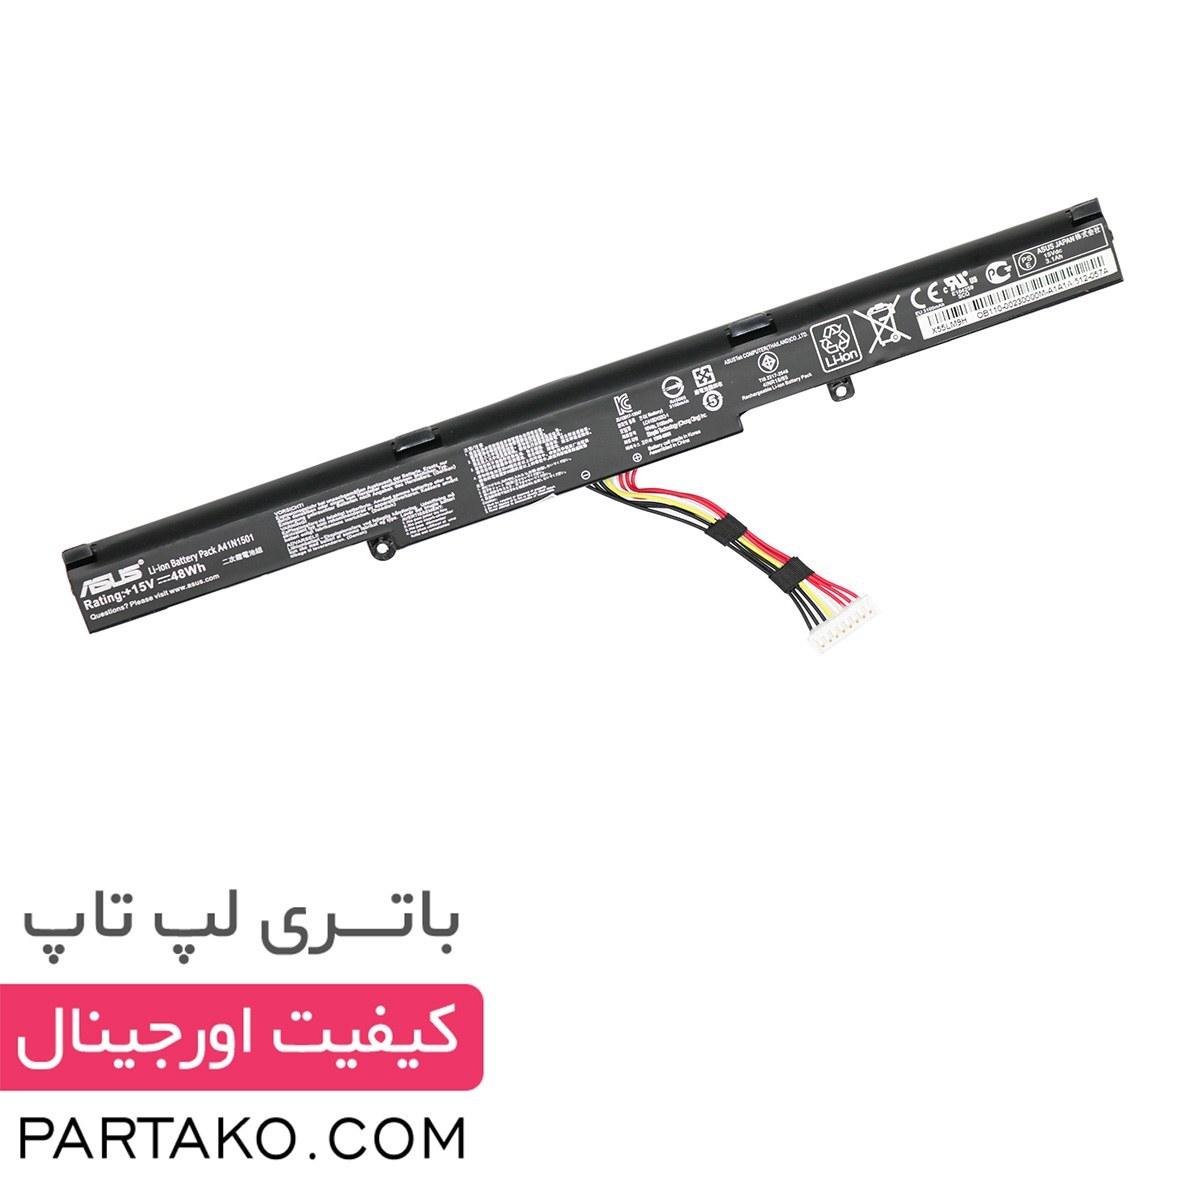 تصویر باتری لپ تاپ ایسوس Asus VivoBook Pro N552V - N552VW ا Battery Asus Notebook A41N1501 | 3200mAh | 15v Battery Asus Notebook A41N1501 | 3200mAh | 15v